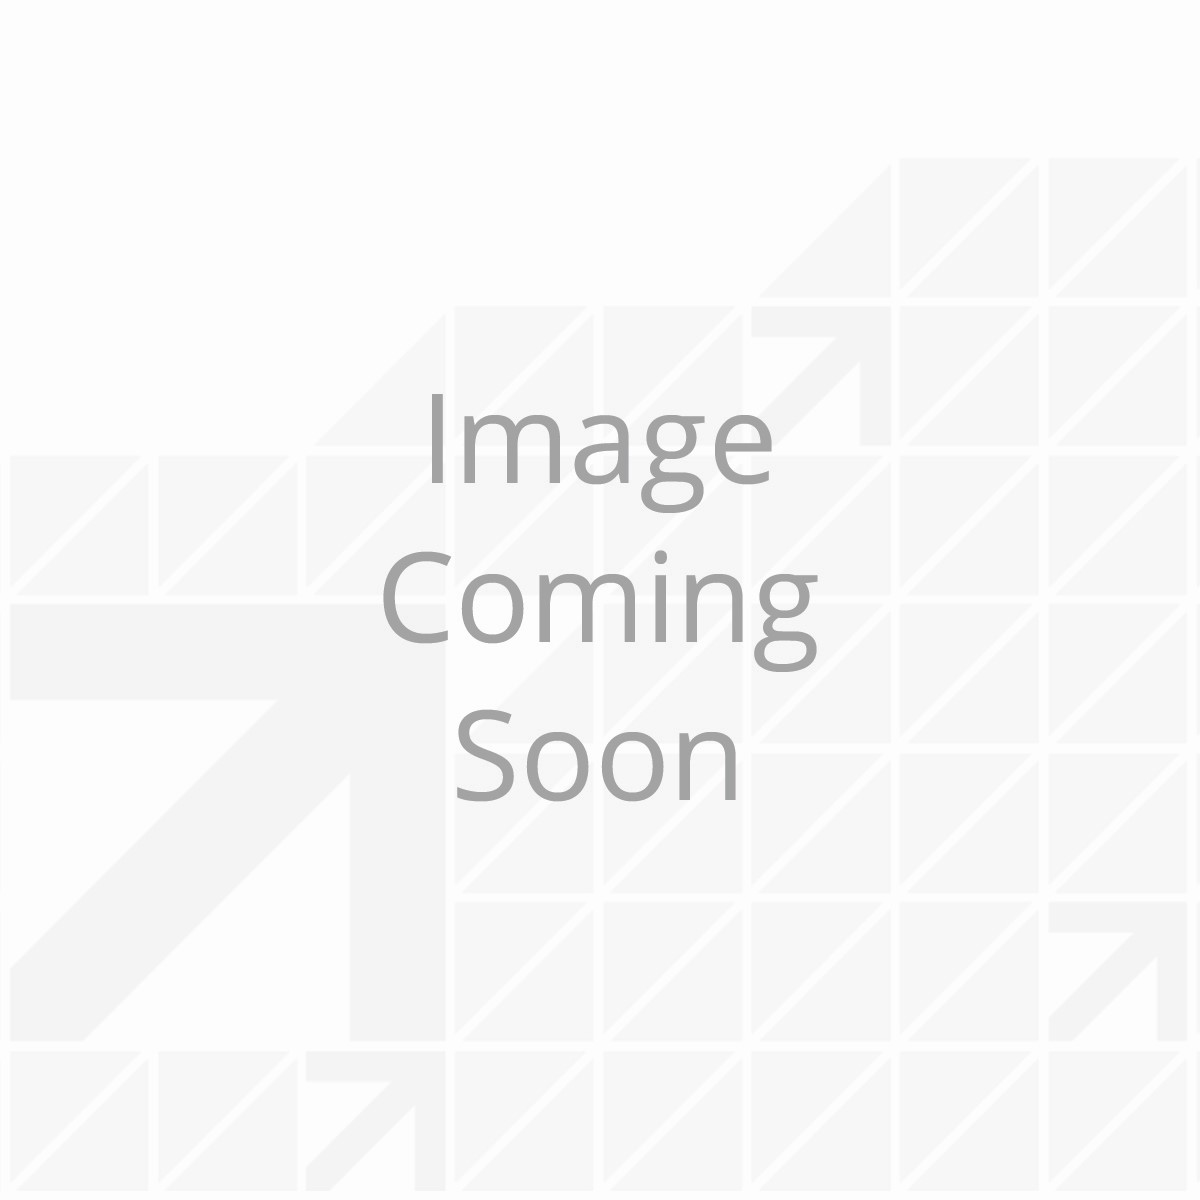 Door Insert Panel for 10 cu ft Refrigerator, Stainless Steel/Black